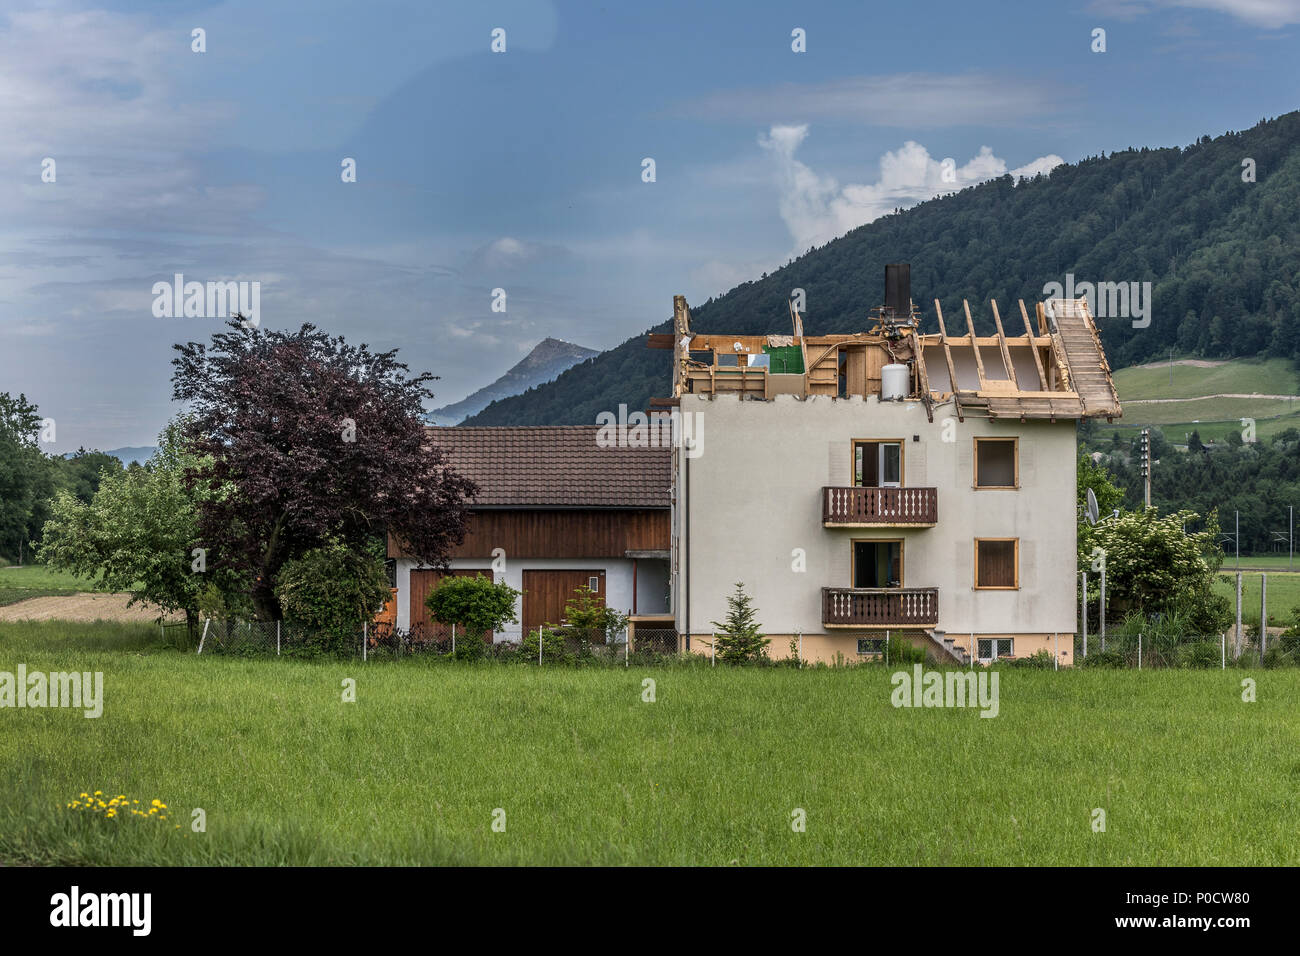 House to be demolished, Blatten, Malters, Lucerne, Switzerland - Stock Image